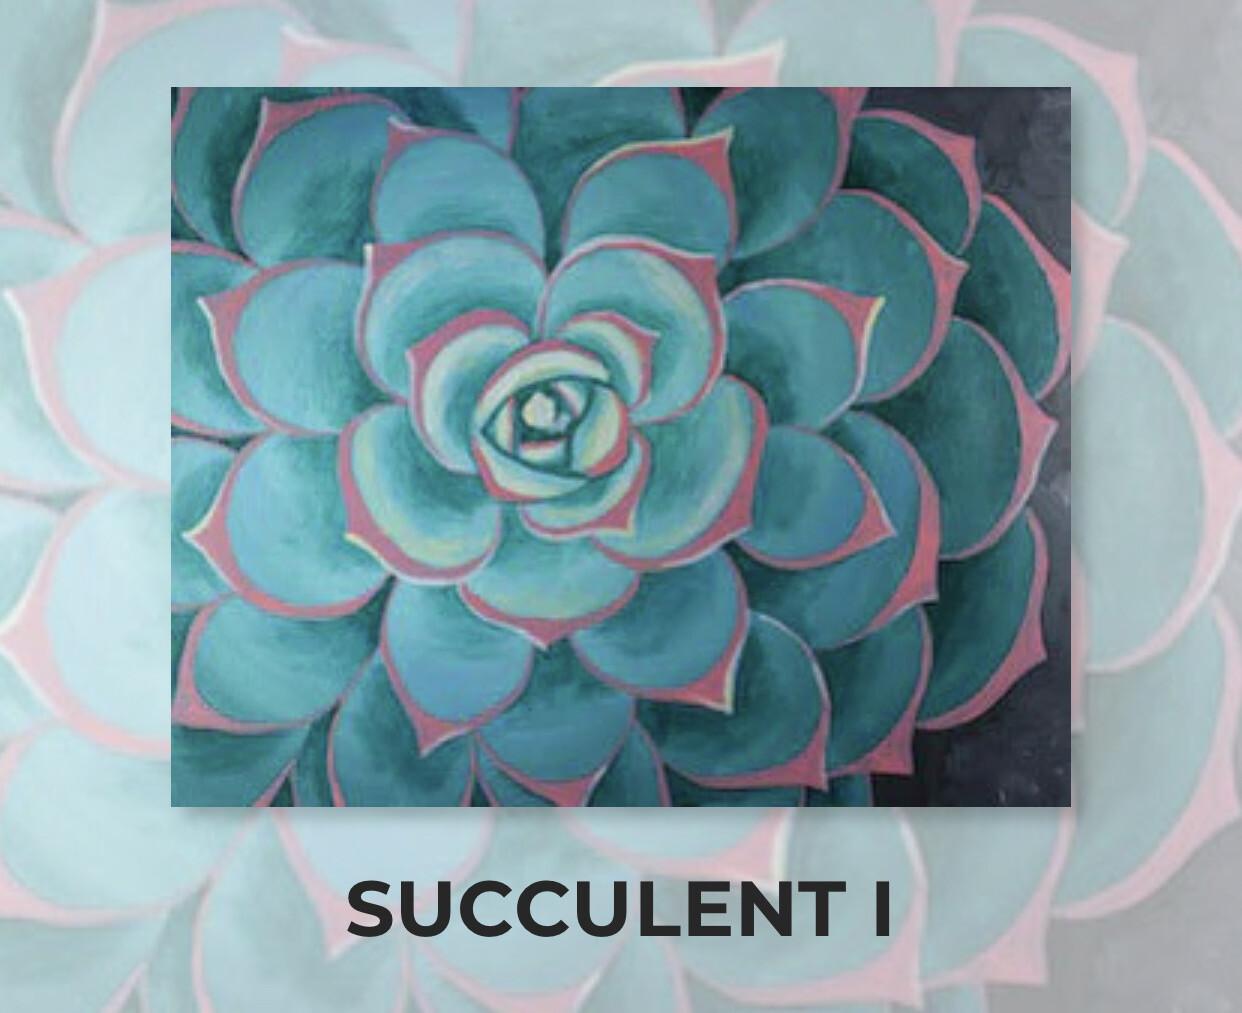 Succulent I ADULT Acrylic Paint On Canvas DIY Art Kit